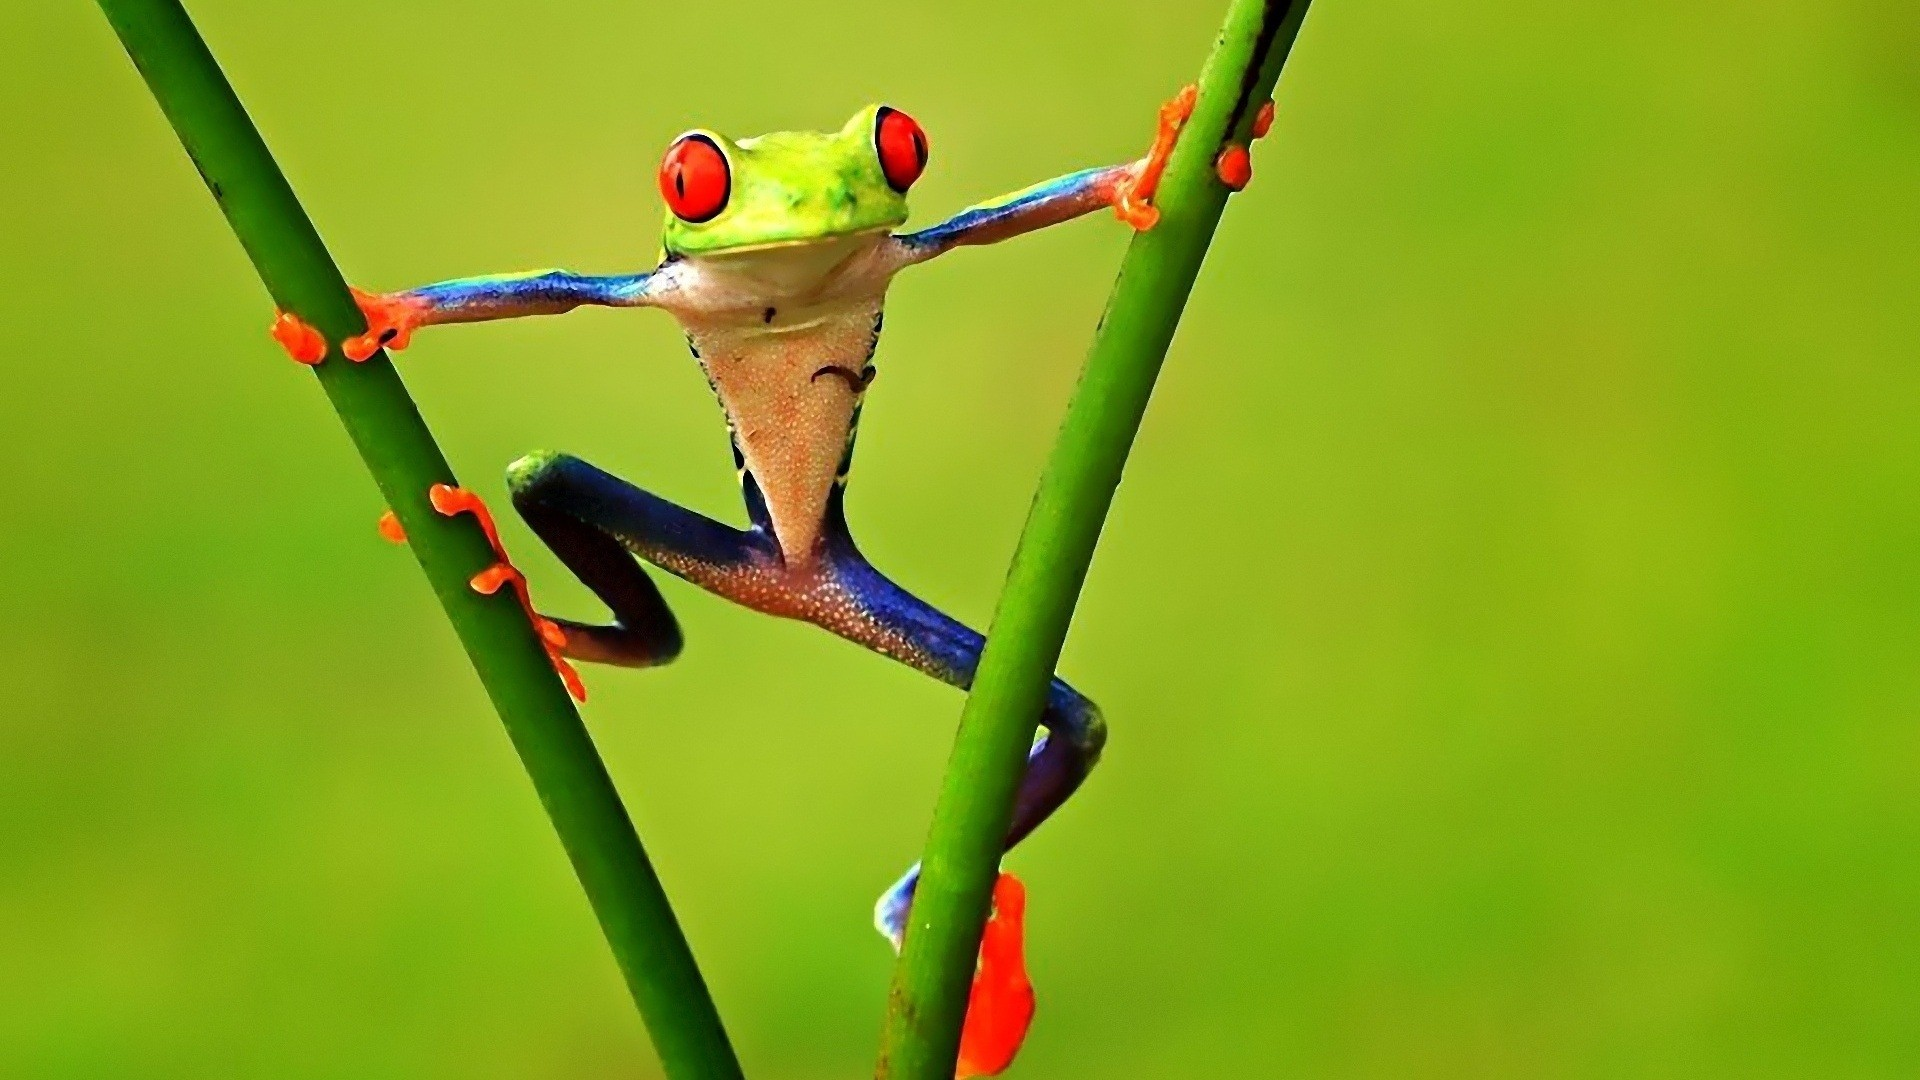 Frog Wallpaper for pc